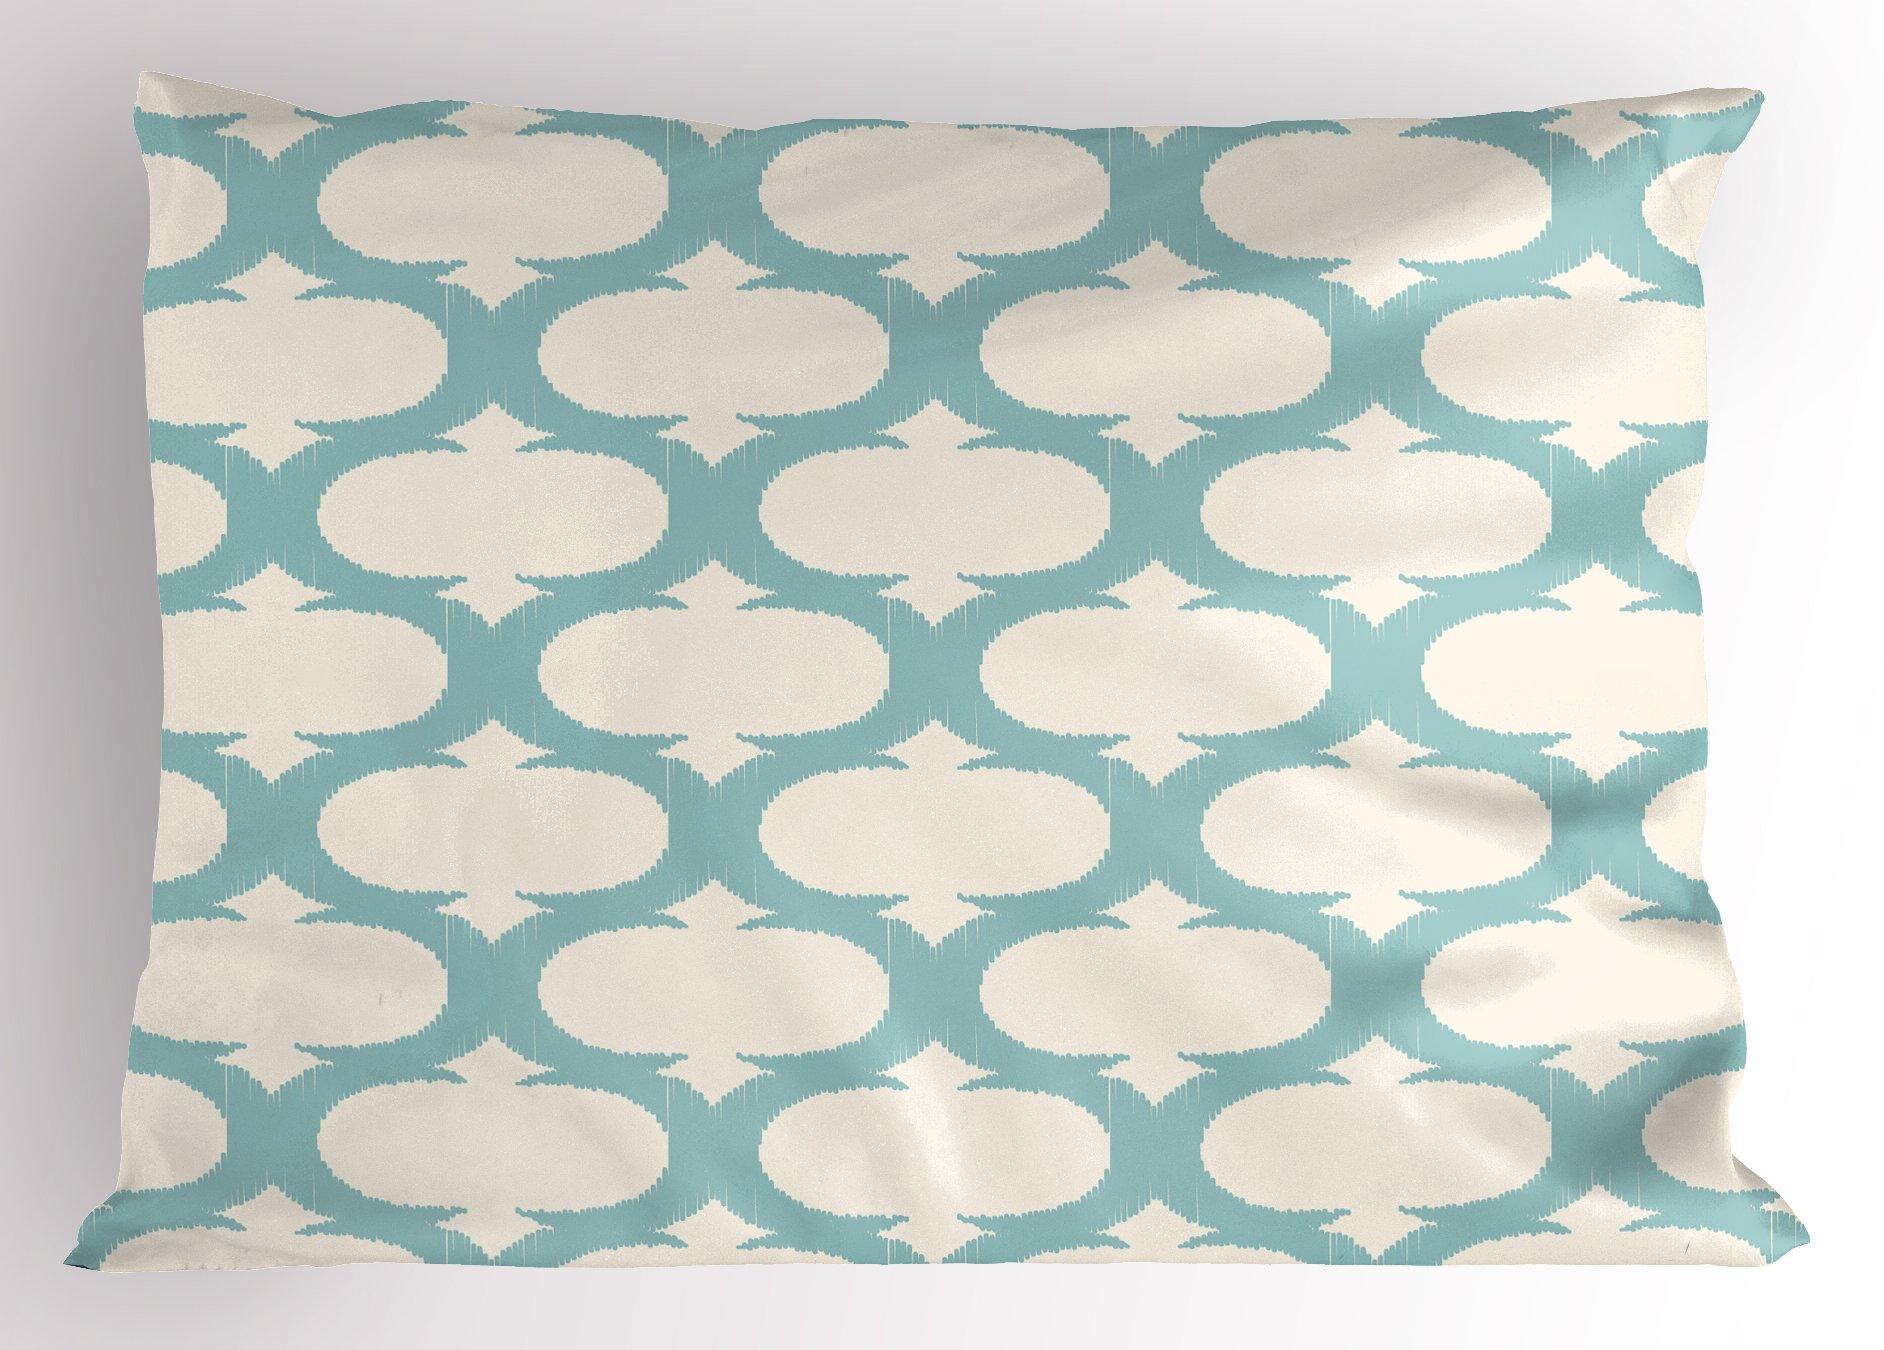 Ambesonne Aqua Pillow Sham, Mesh Pattern with Curvy Figures Ancient Arabic Lattice Design Old Fashioned Pastel, Decorative Standard King Size Printed Pillowcase, 36 X 20 inches, Seafoam Cream